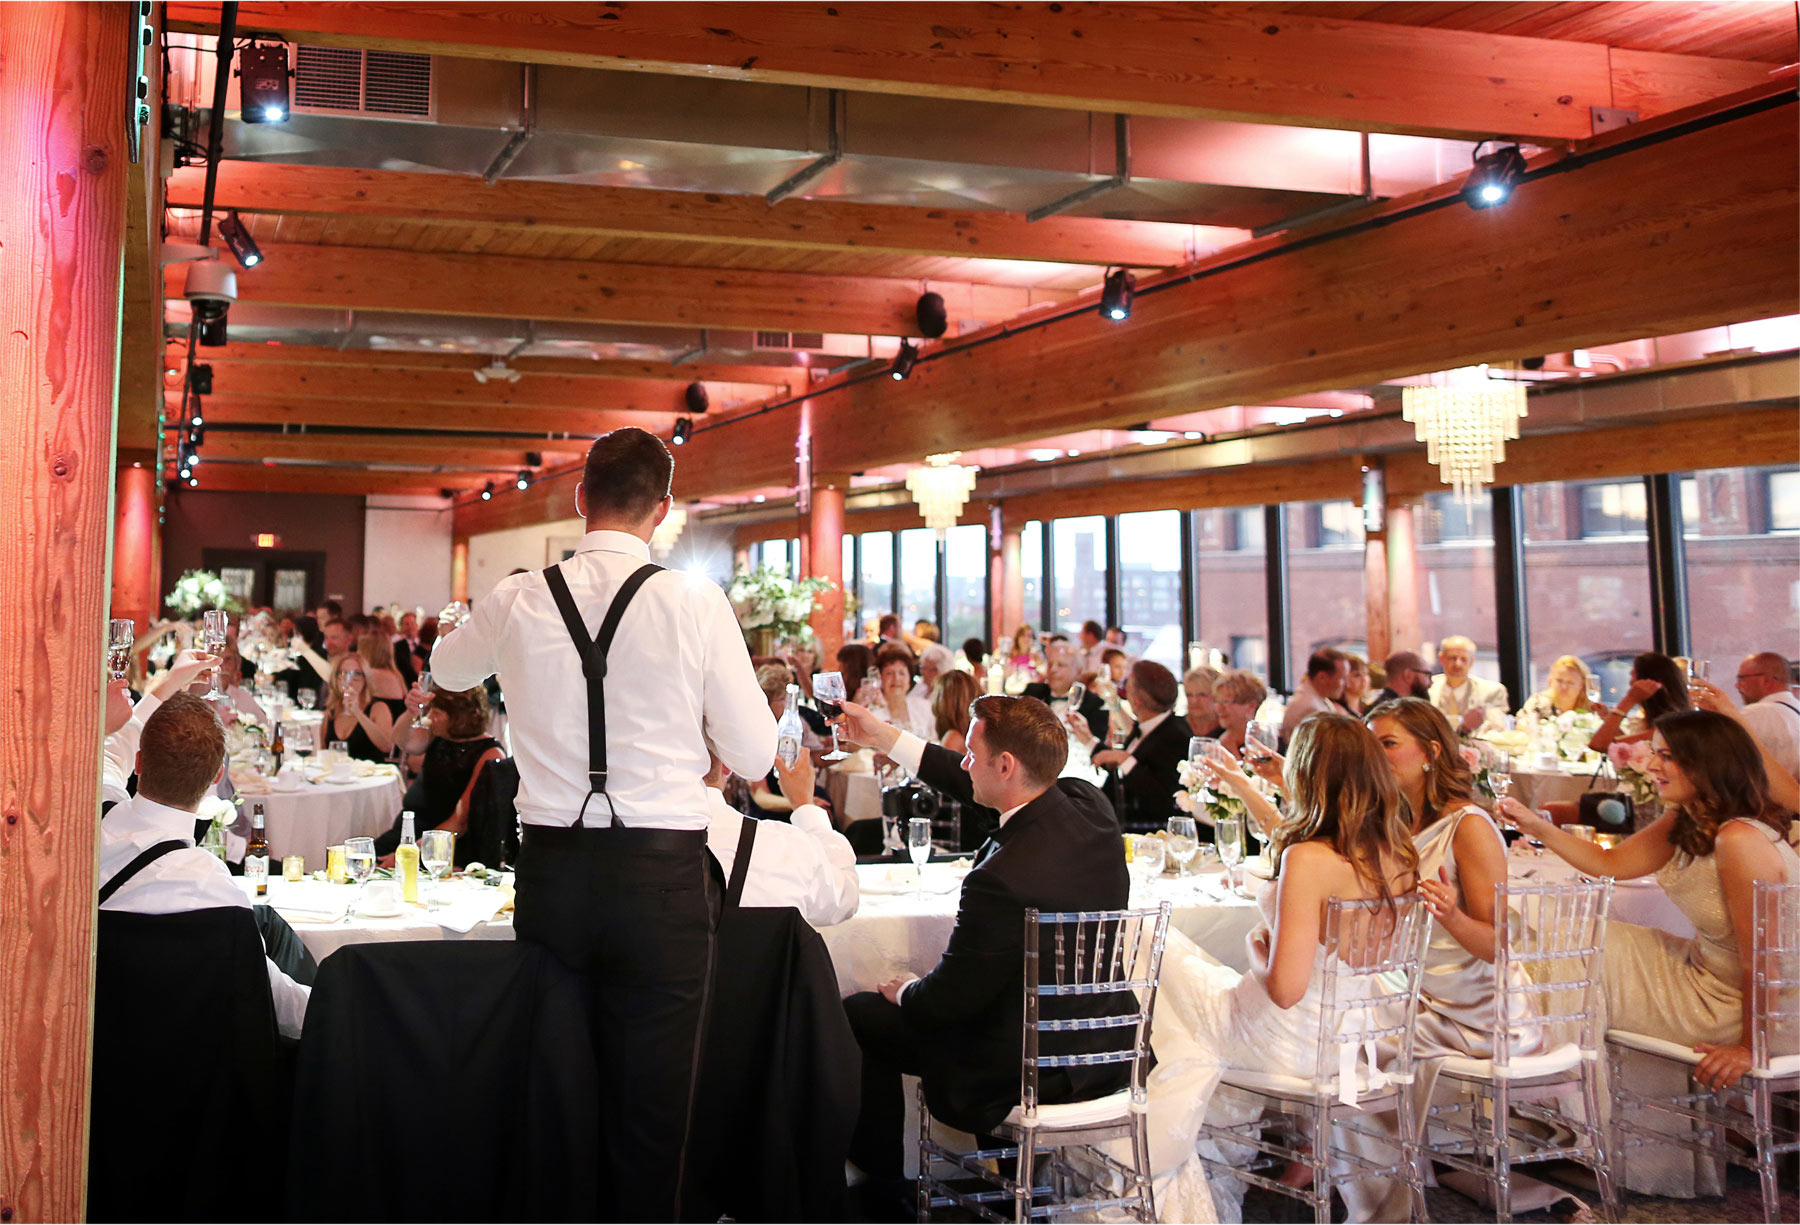 25-Saint-Paul-Minnesota-Wedding-Photographer-by-Andrew-Vick-Photography-Summer-Abulae-Bride-Groom-Groomsmen-Speeches-Toasts-Molly-and-Dan.jpg